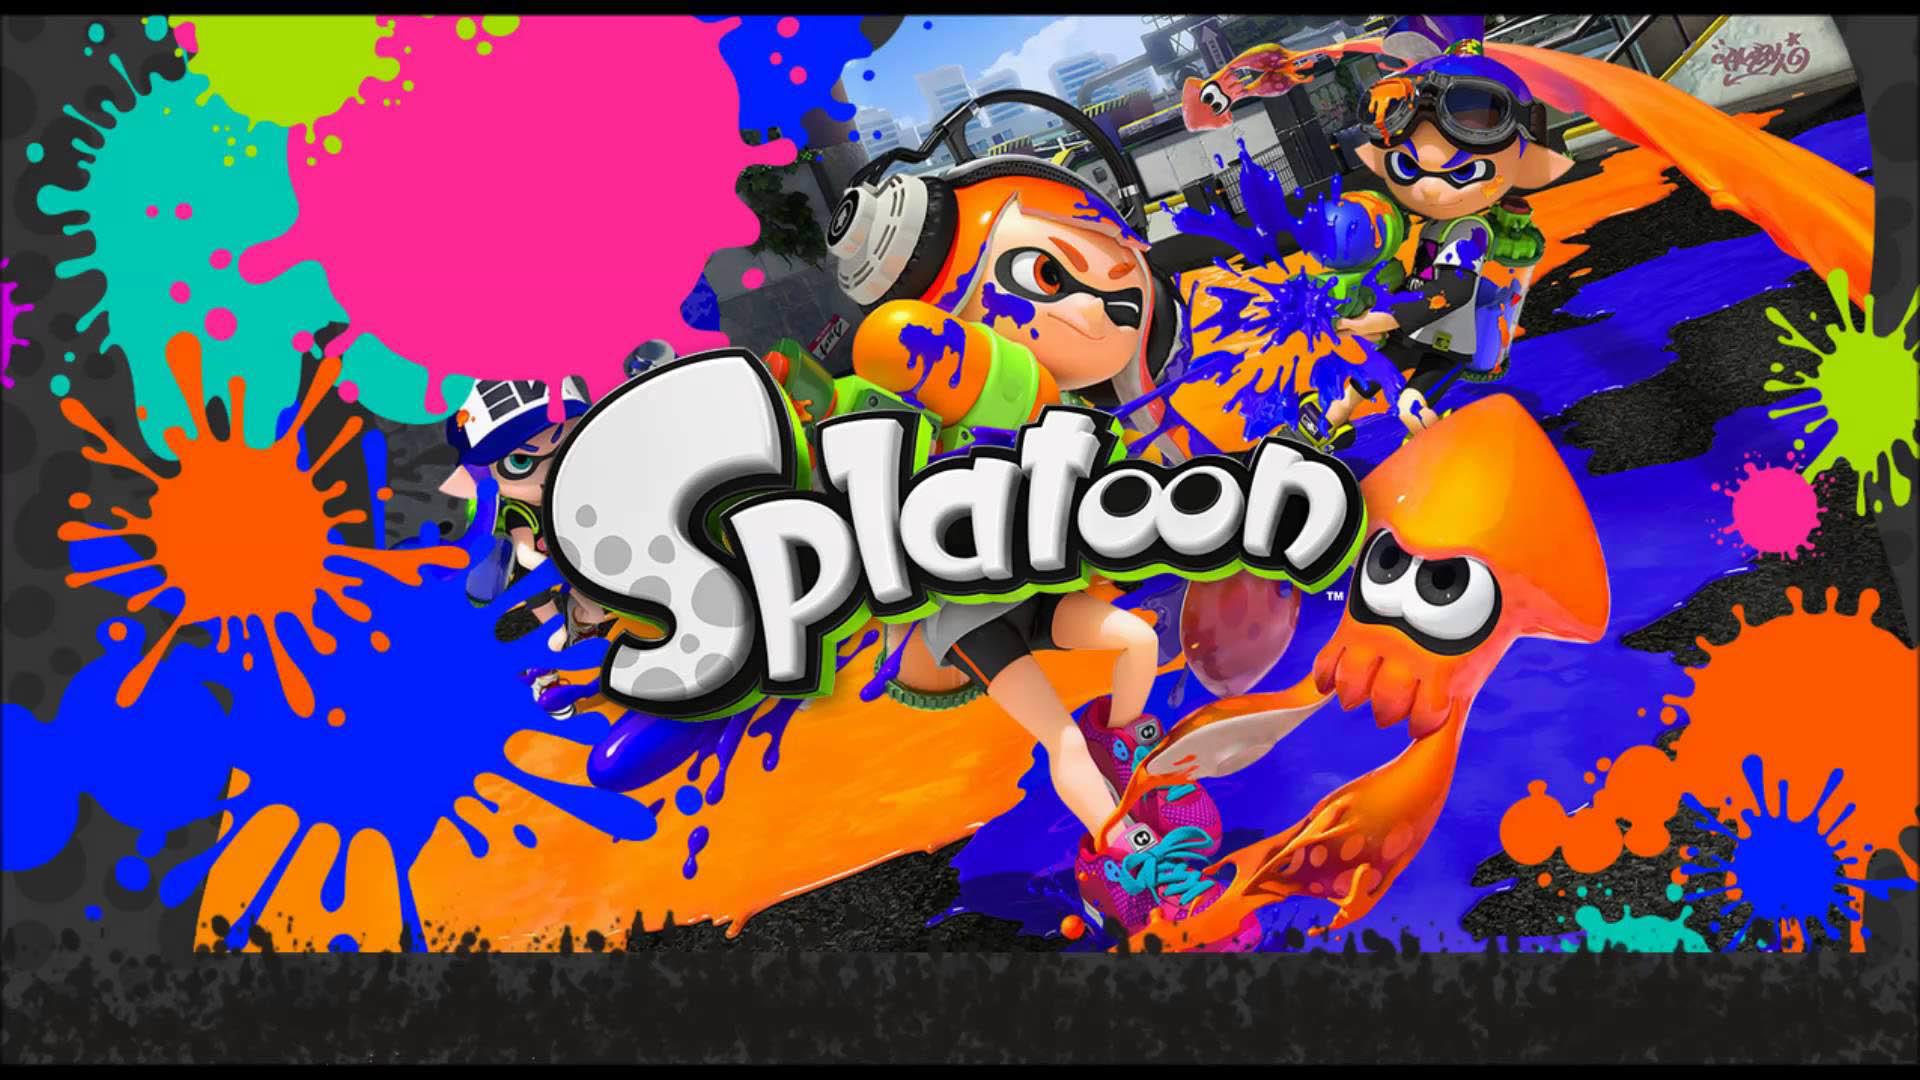 Splatoon Colored Nintendo Wii U Game wallpaper